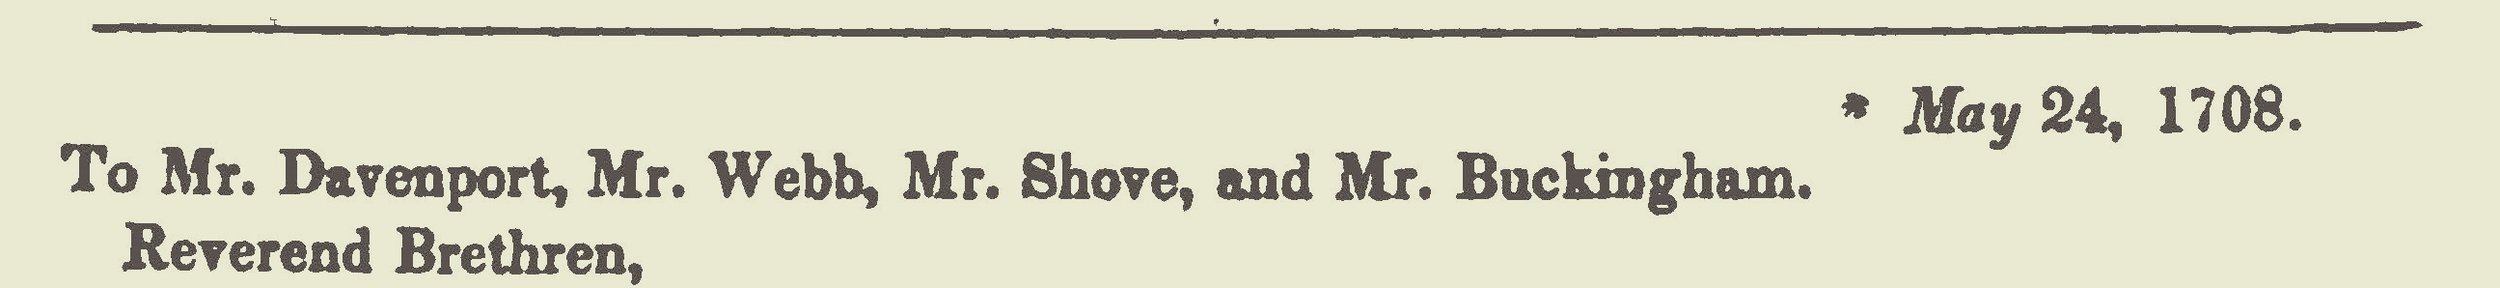 Hampton, John, 1708 Letter to Connecticut Title Page.jpg